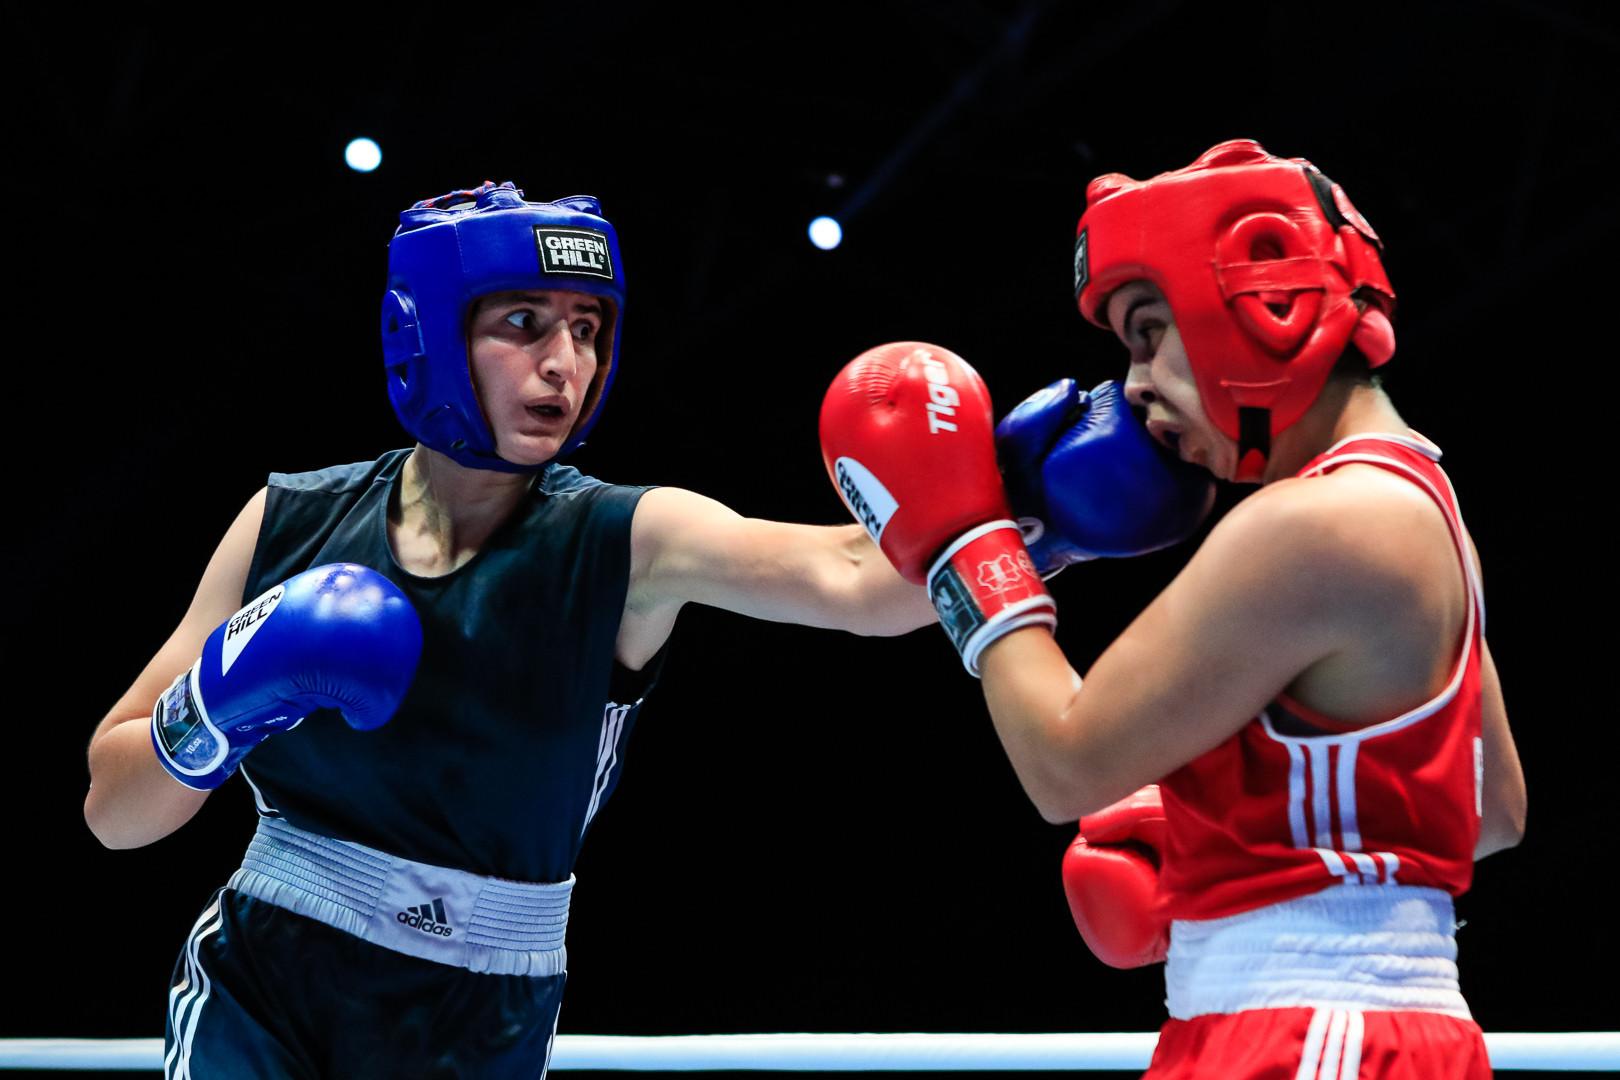 Tajikistan's Nilufar Boboyorova edged past Chahira Selmouni of Algeria at the AIBA Women's World Championships ©AIBA